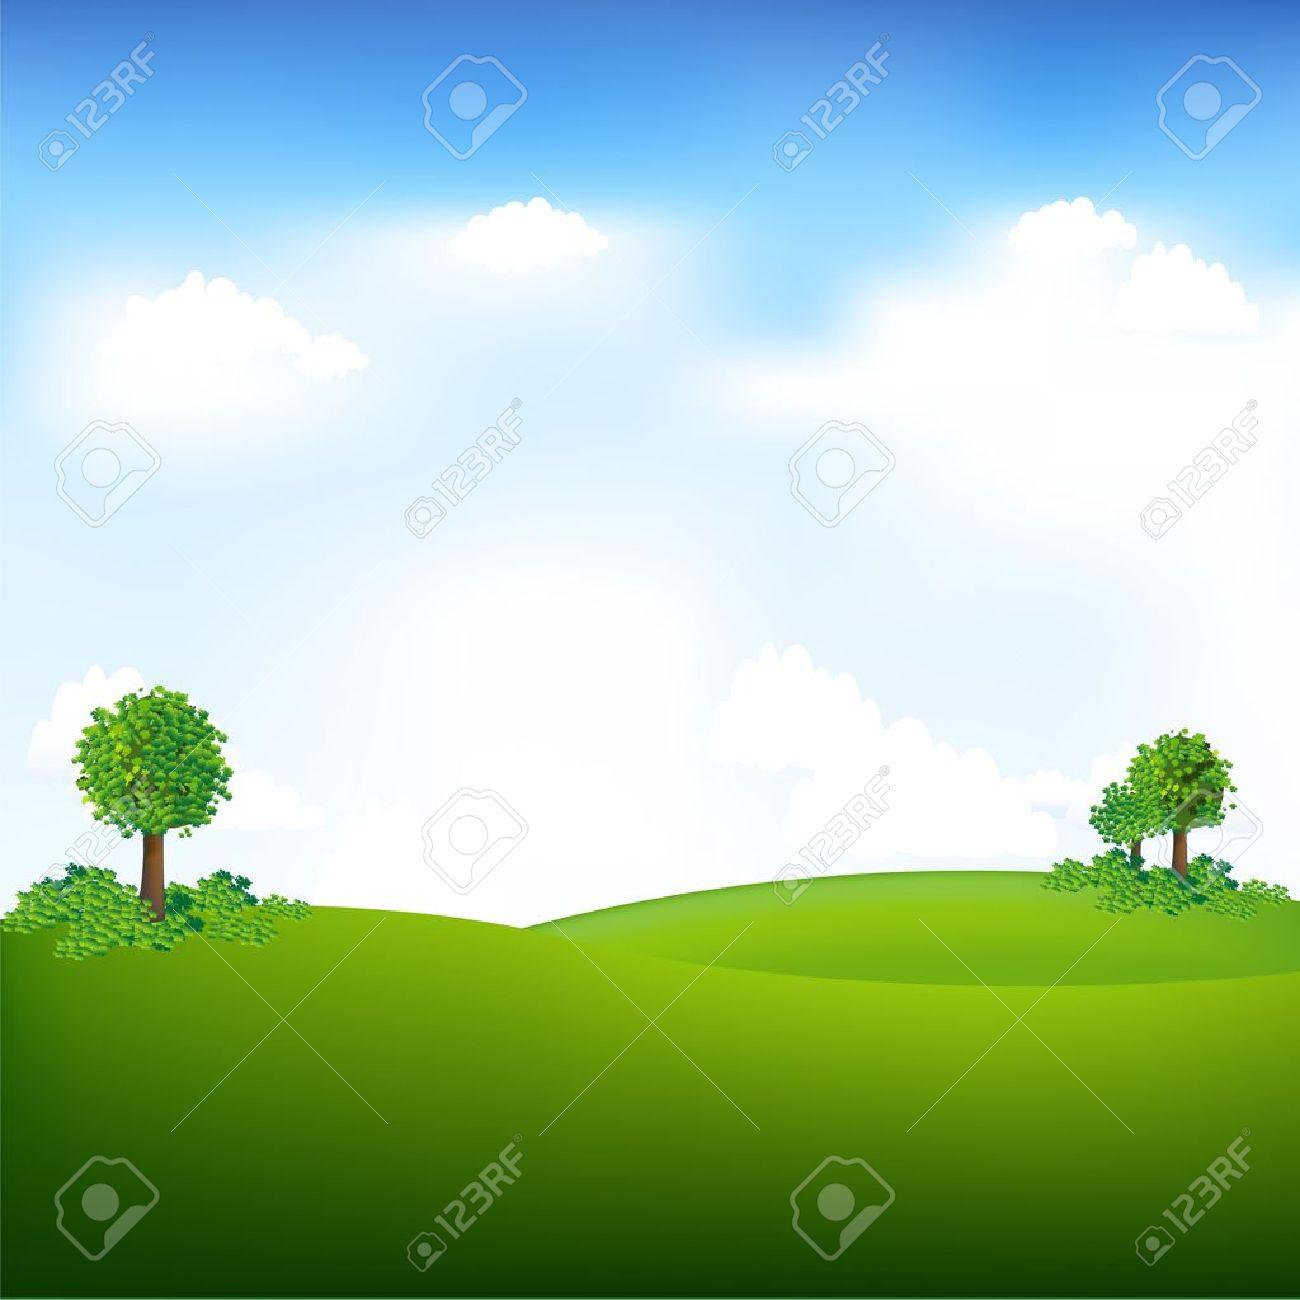 Sky And Landscape, Vector Illustration - 10627293